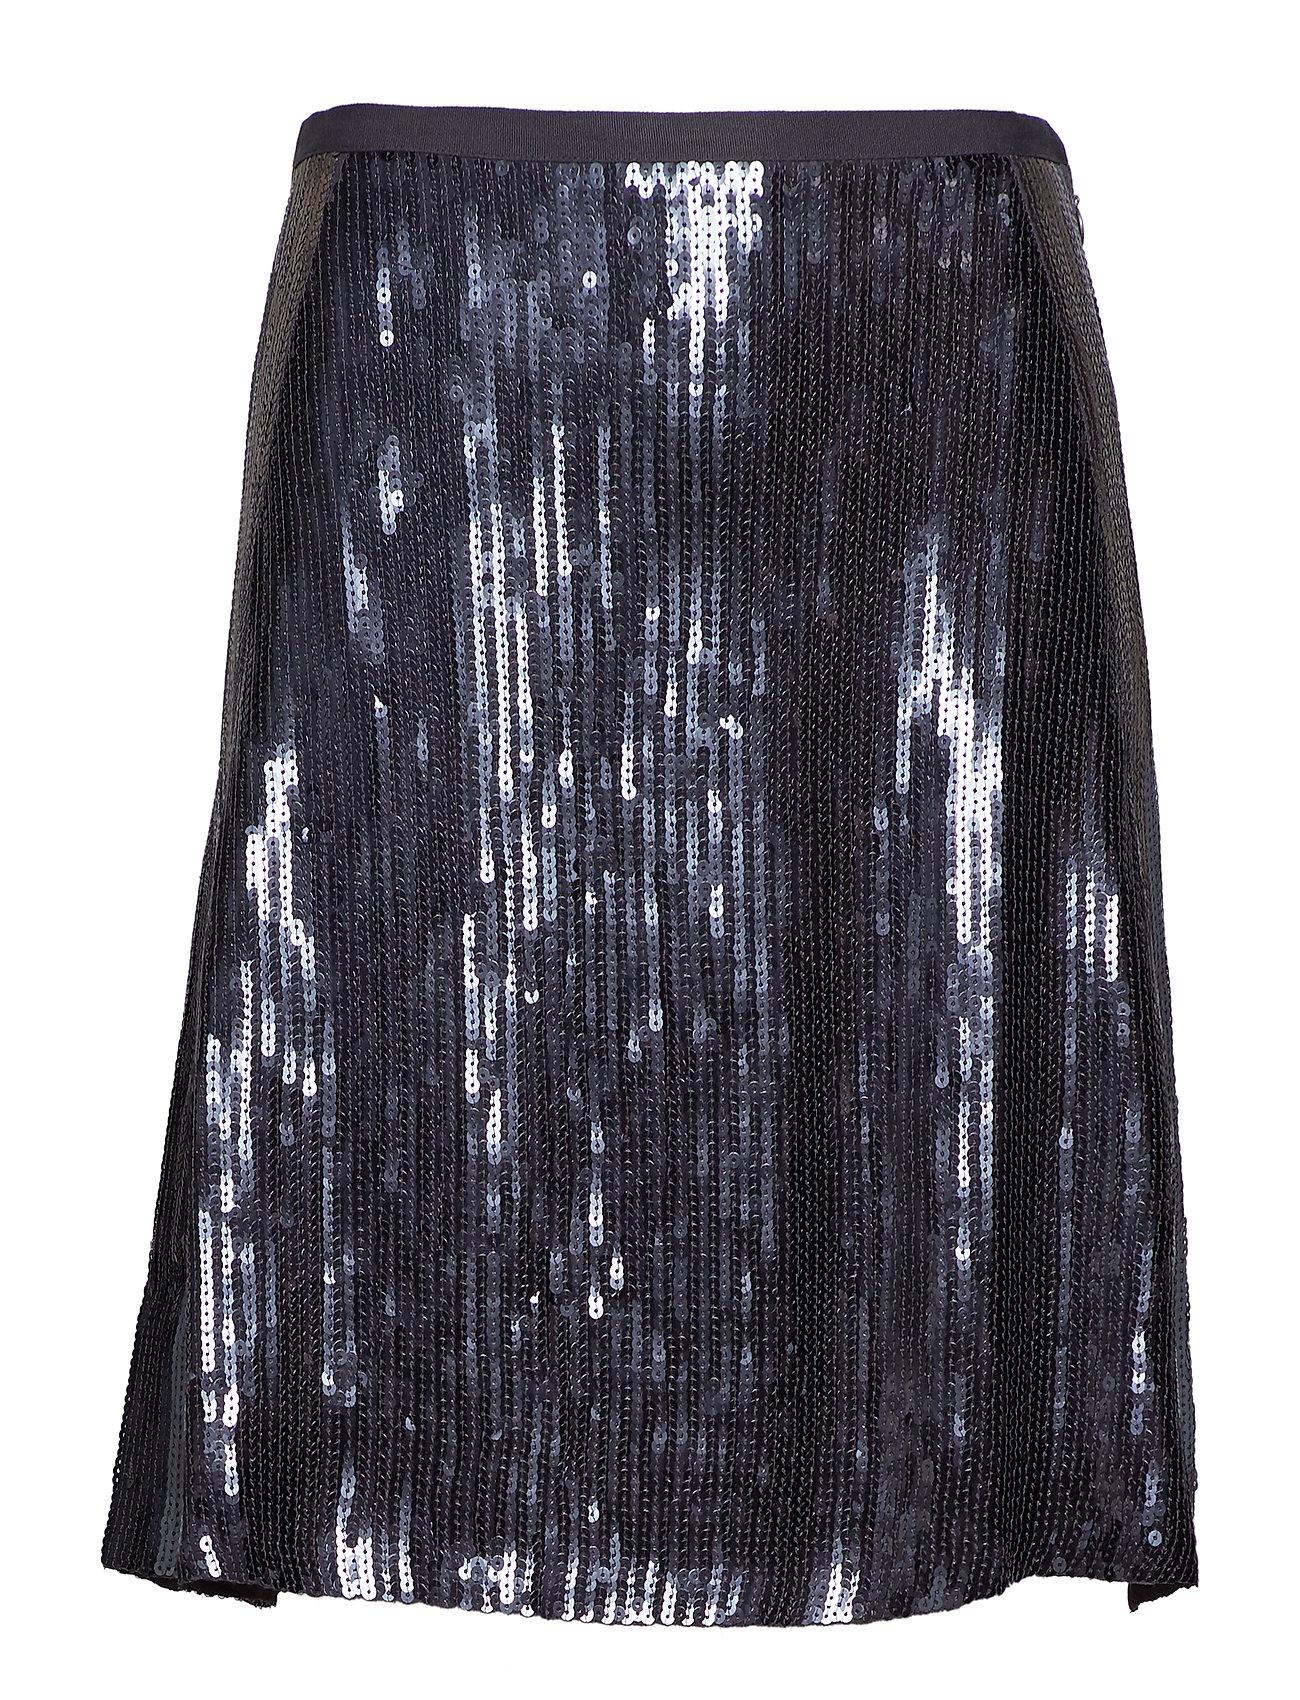 ODD MOLLY fast lane skirt - ALMOST BLACK